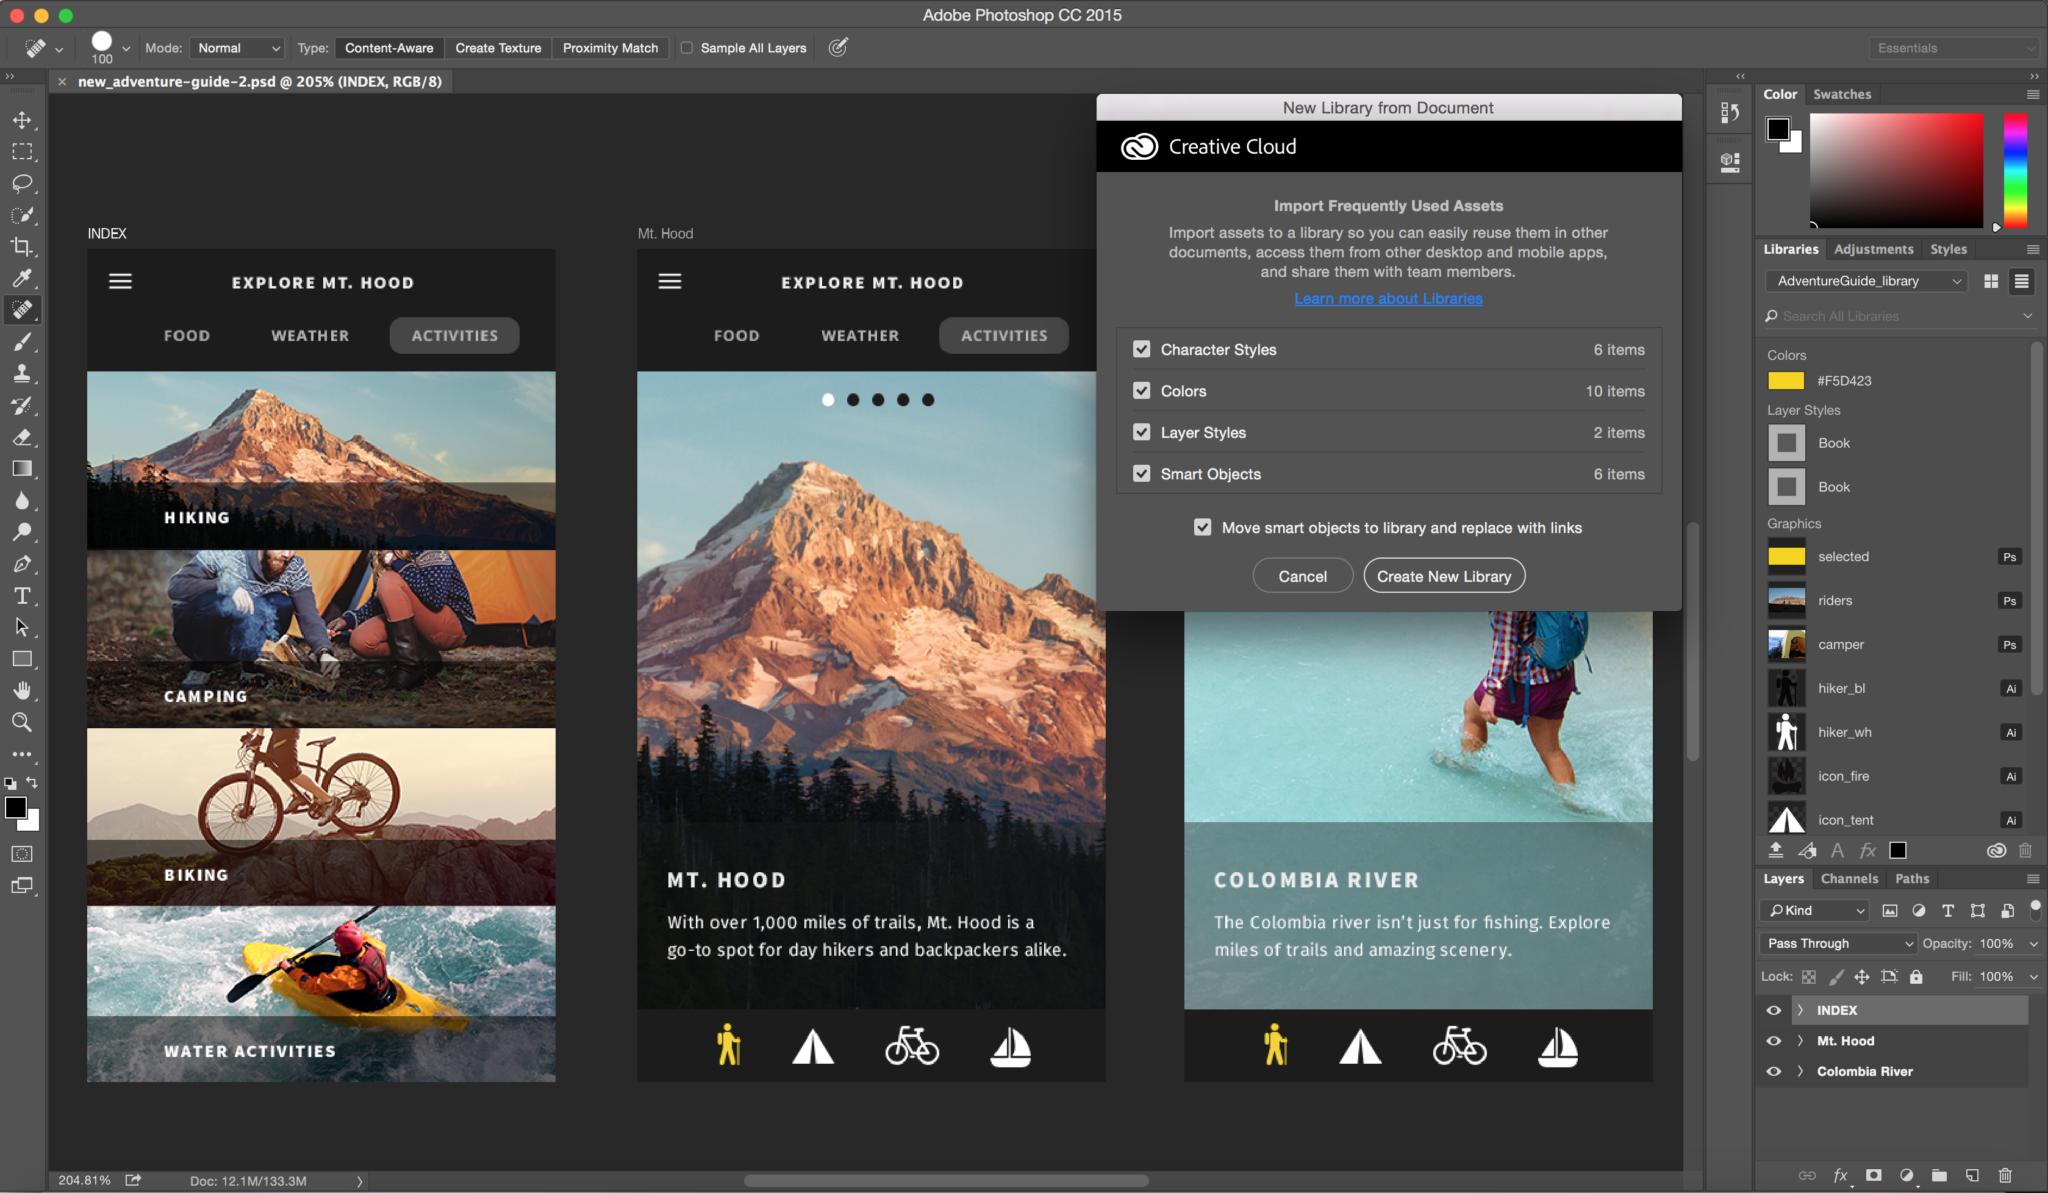 Adobe Announces Latest Version of Photoshop CC